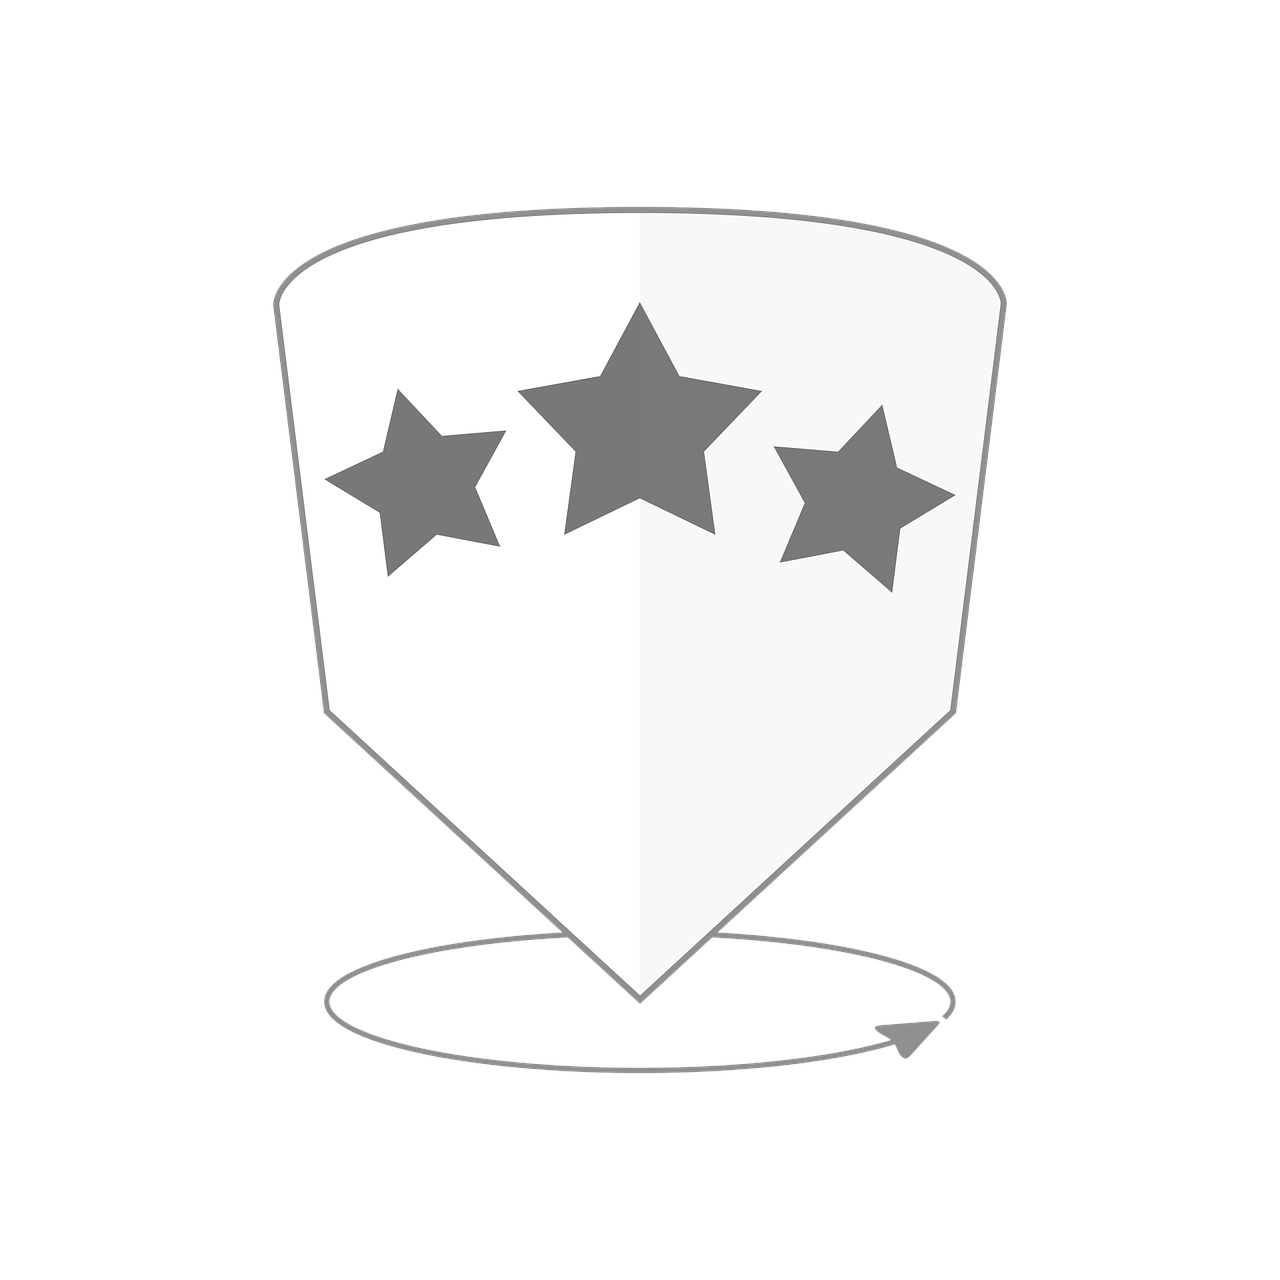 star-1976108_1280-1 Home